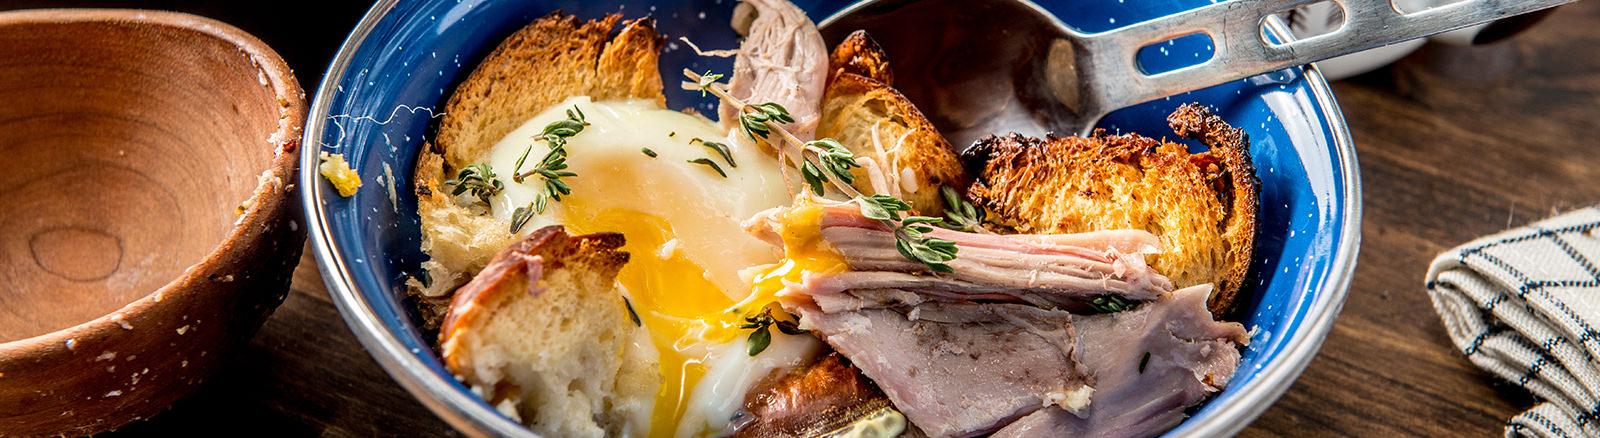 Traeger Recipe - Turkey Stuffing Hash Traeger Wood Pellet Grills